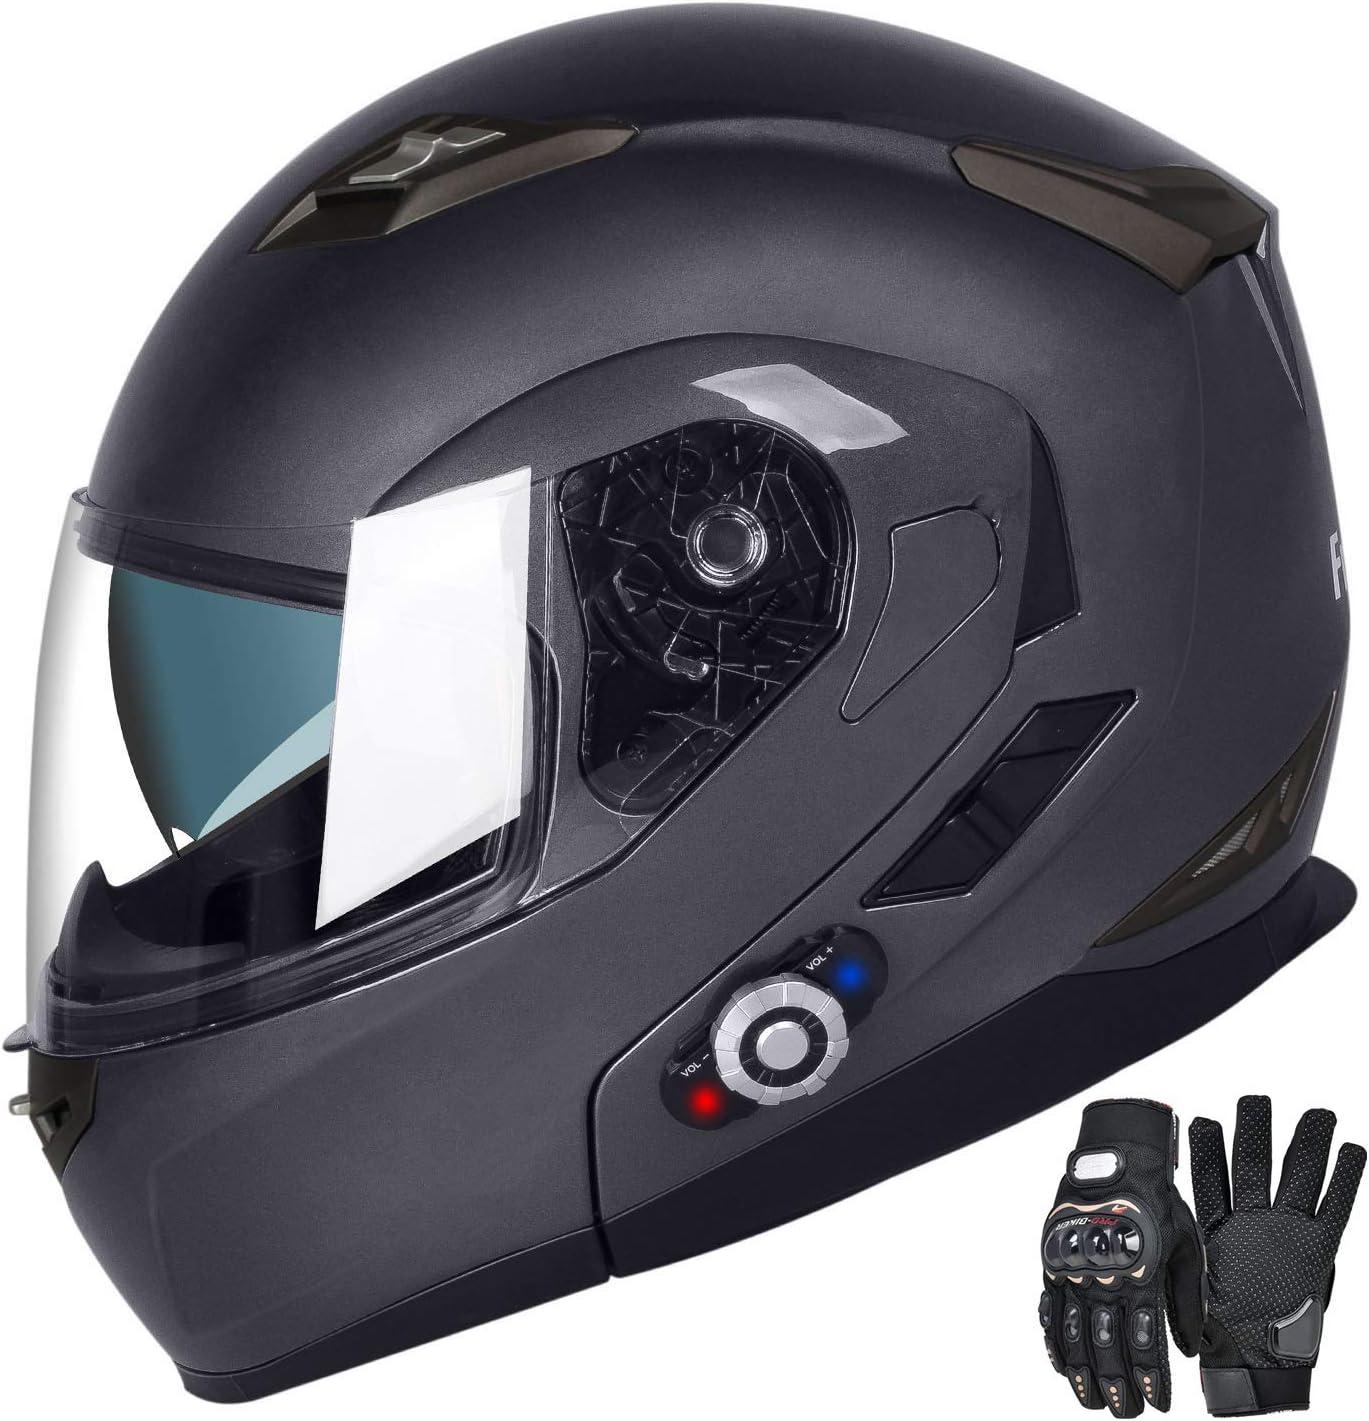 DOT Approved Helmet Motorcycle Bluetooth Helmets Built-in Mp3 FM Radio Integrated Intercom Communication System Modular Flip up Dual Visors Full Face Helmets